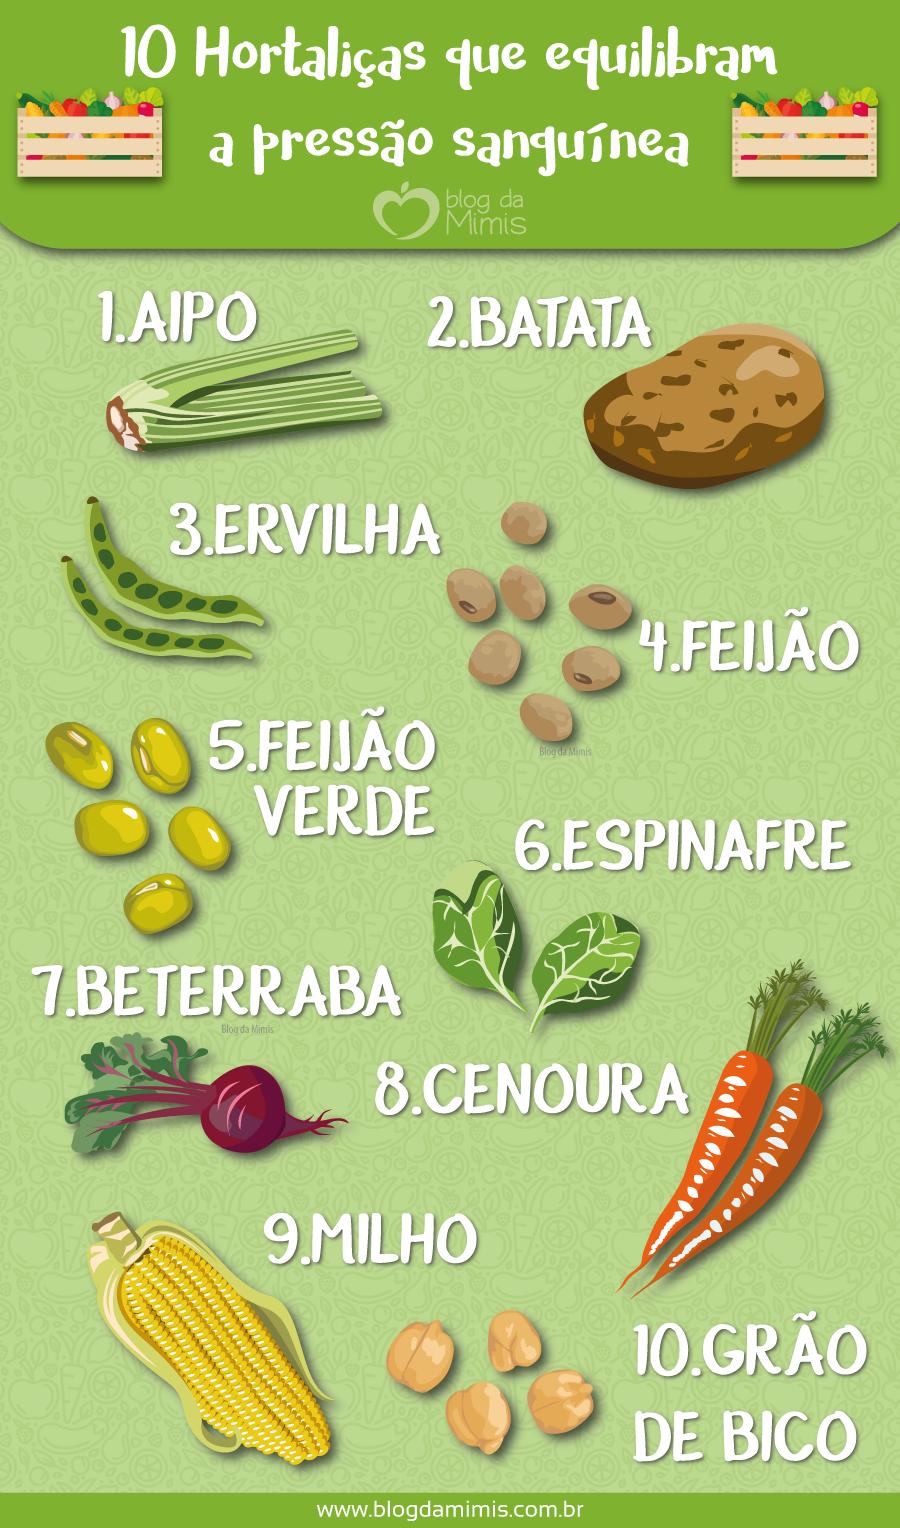 hortaliças-pressão-sanguinea-blog-da-mimis-michelle-franzoni-post